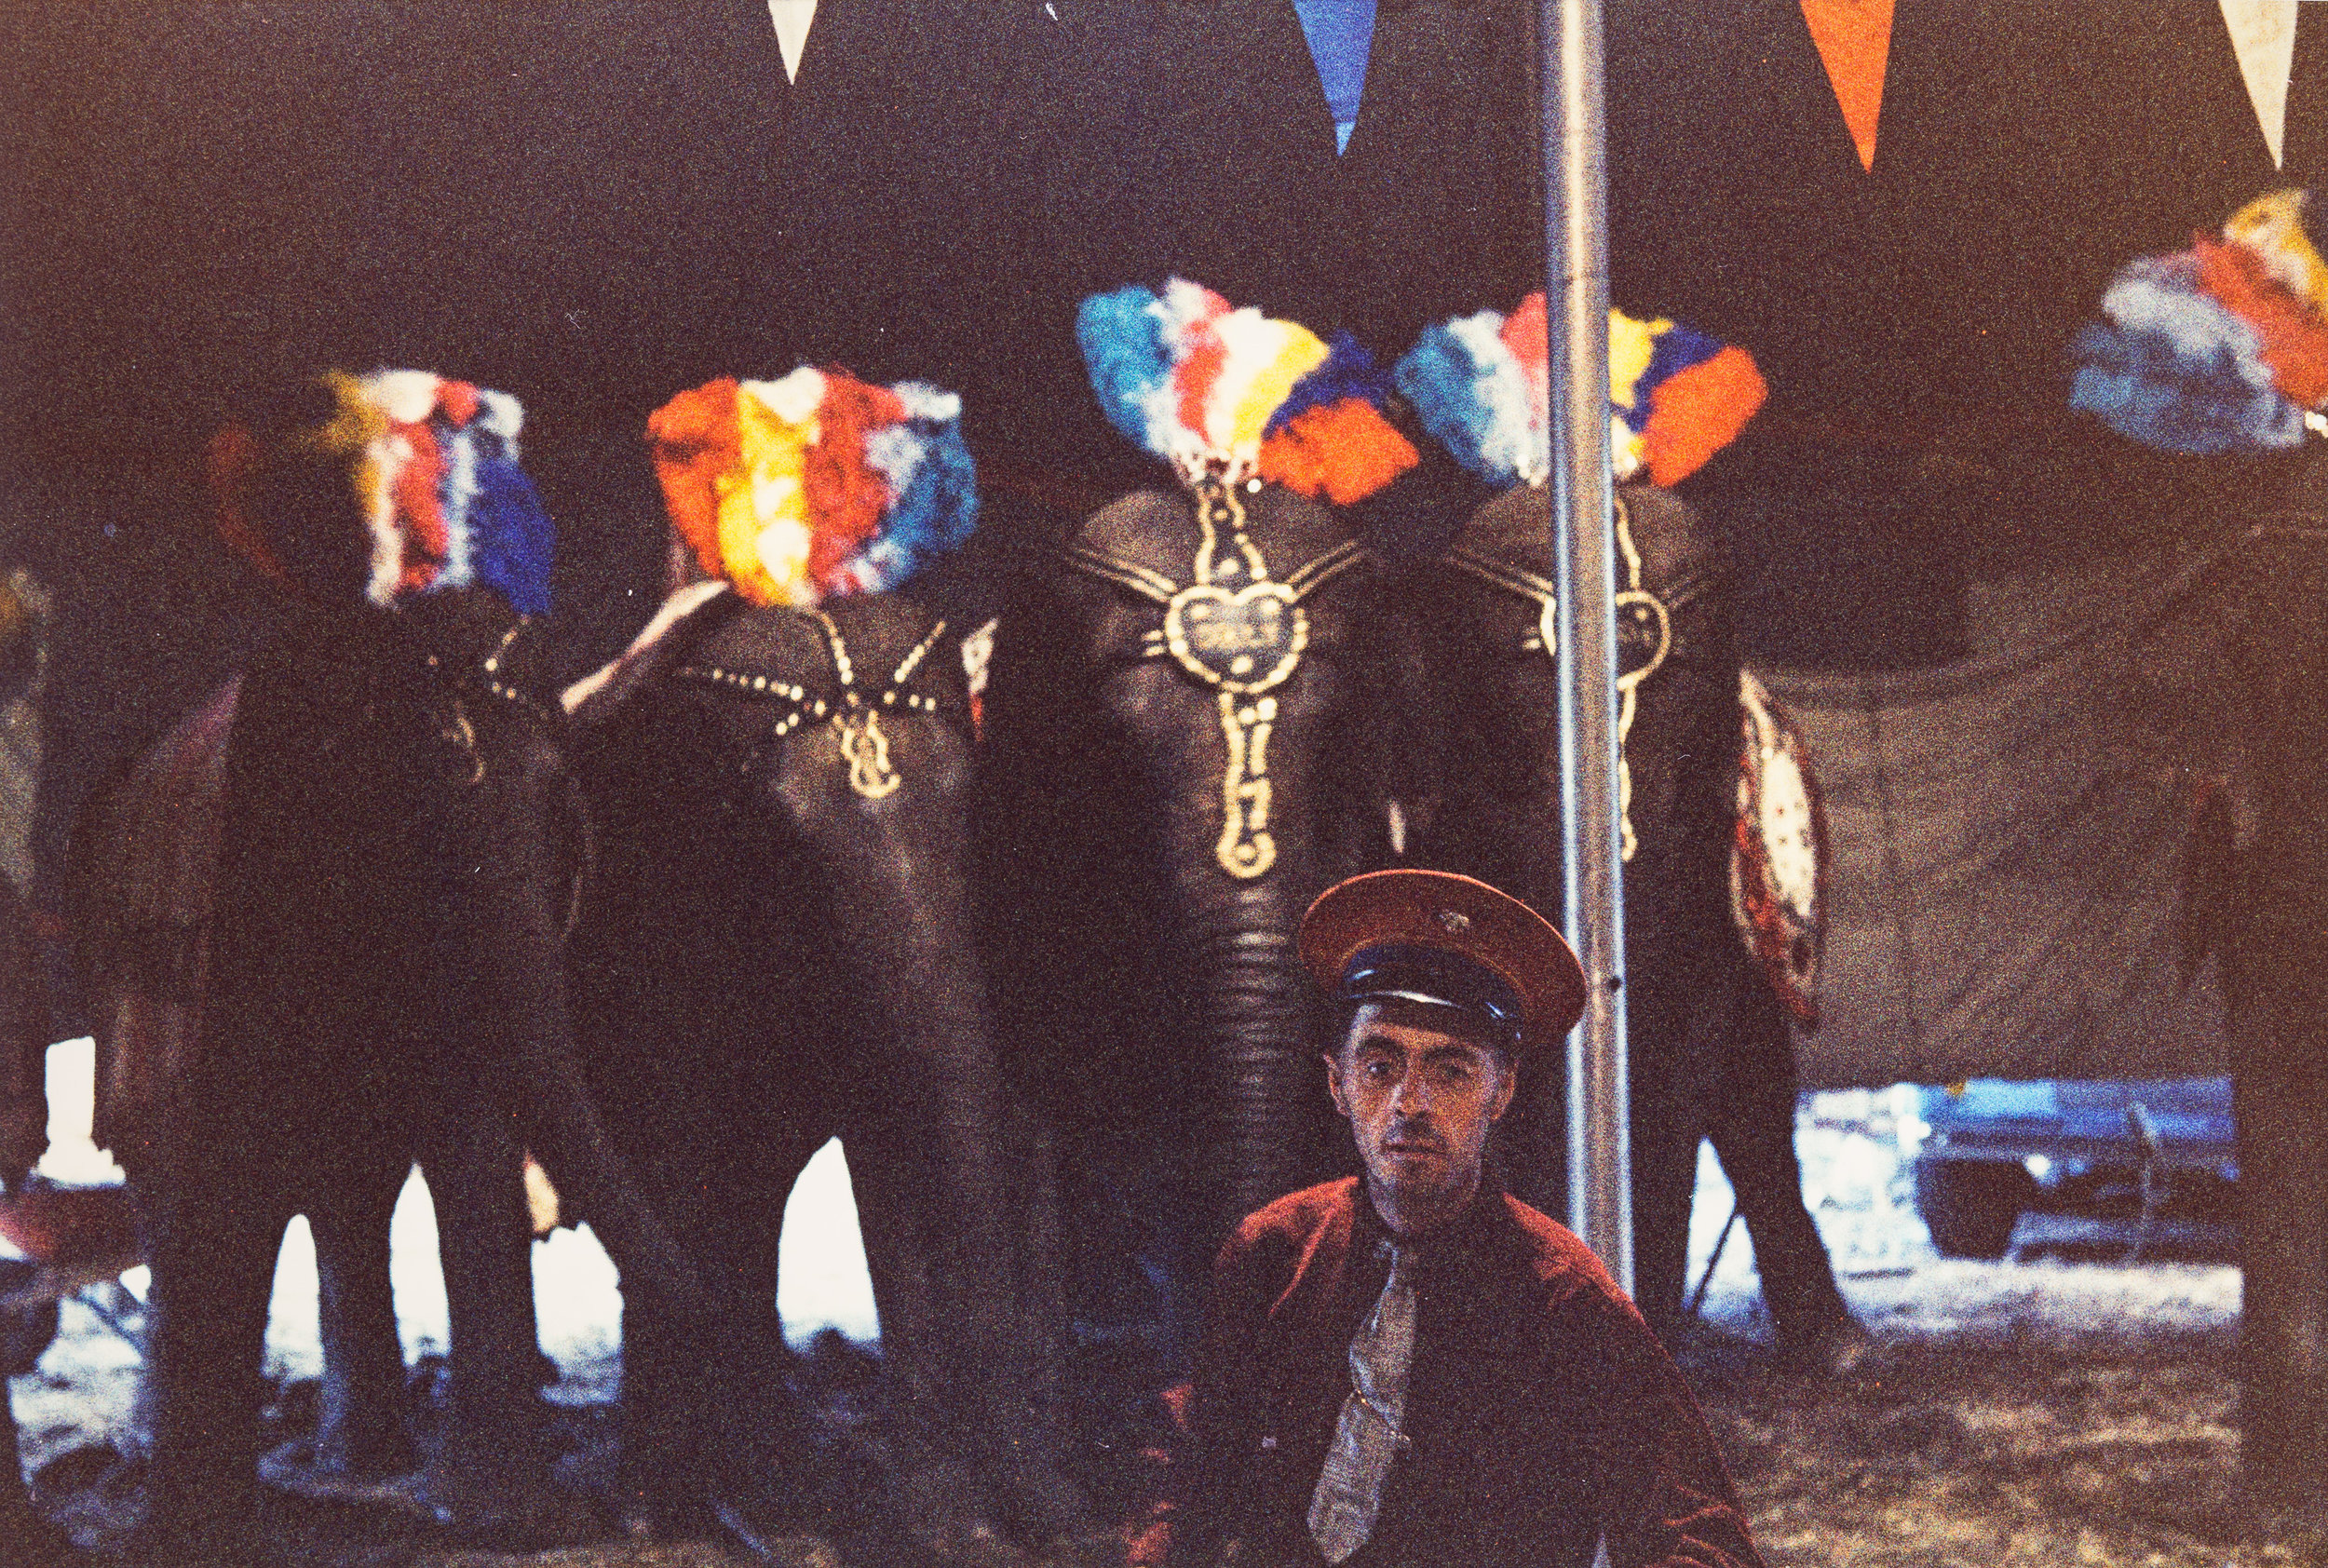 Man with elephants, NYC, 1959